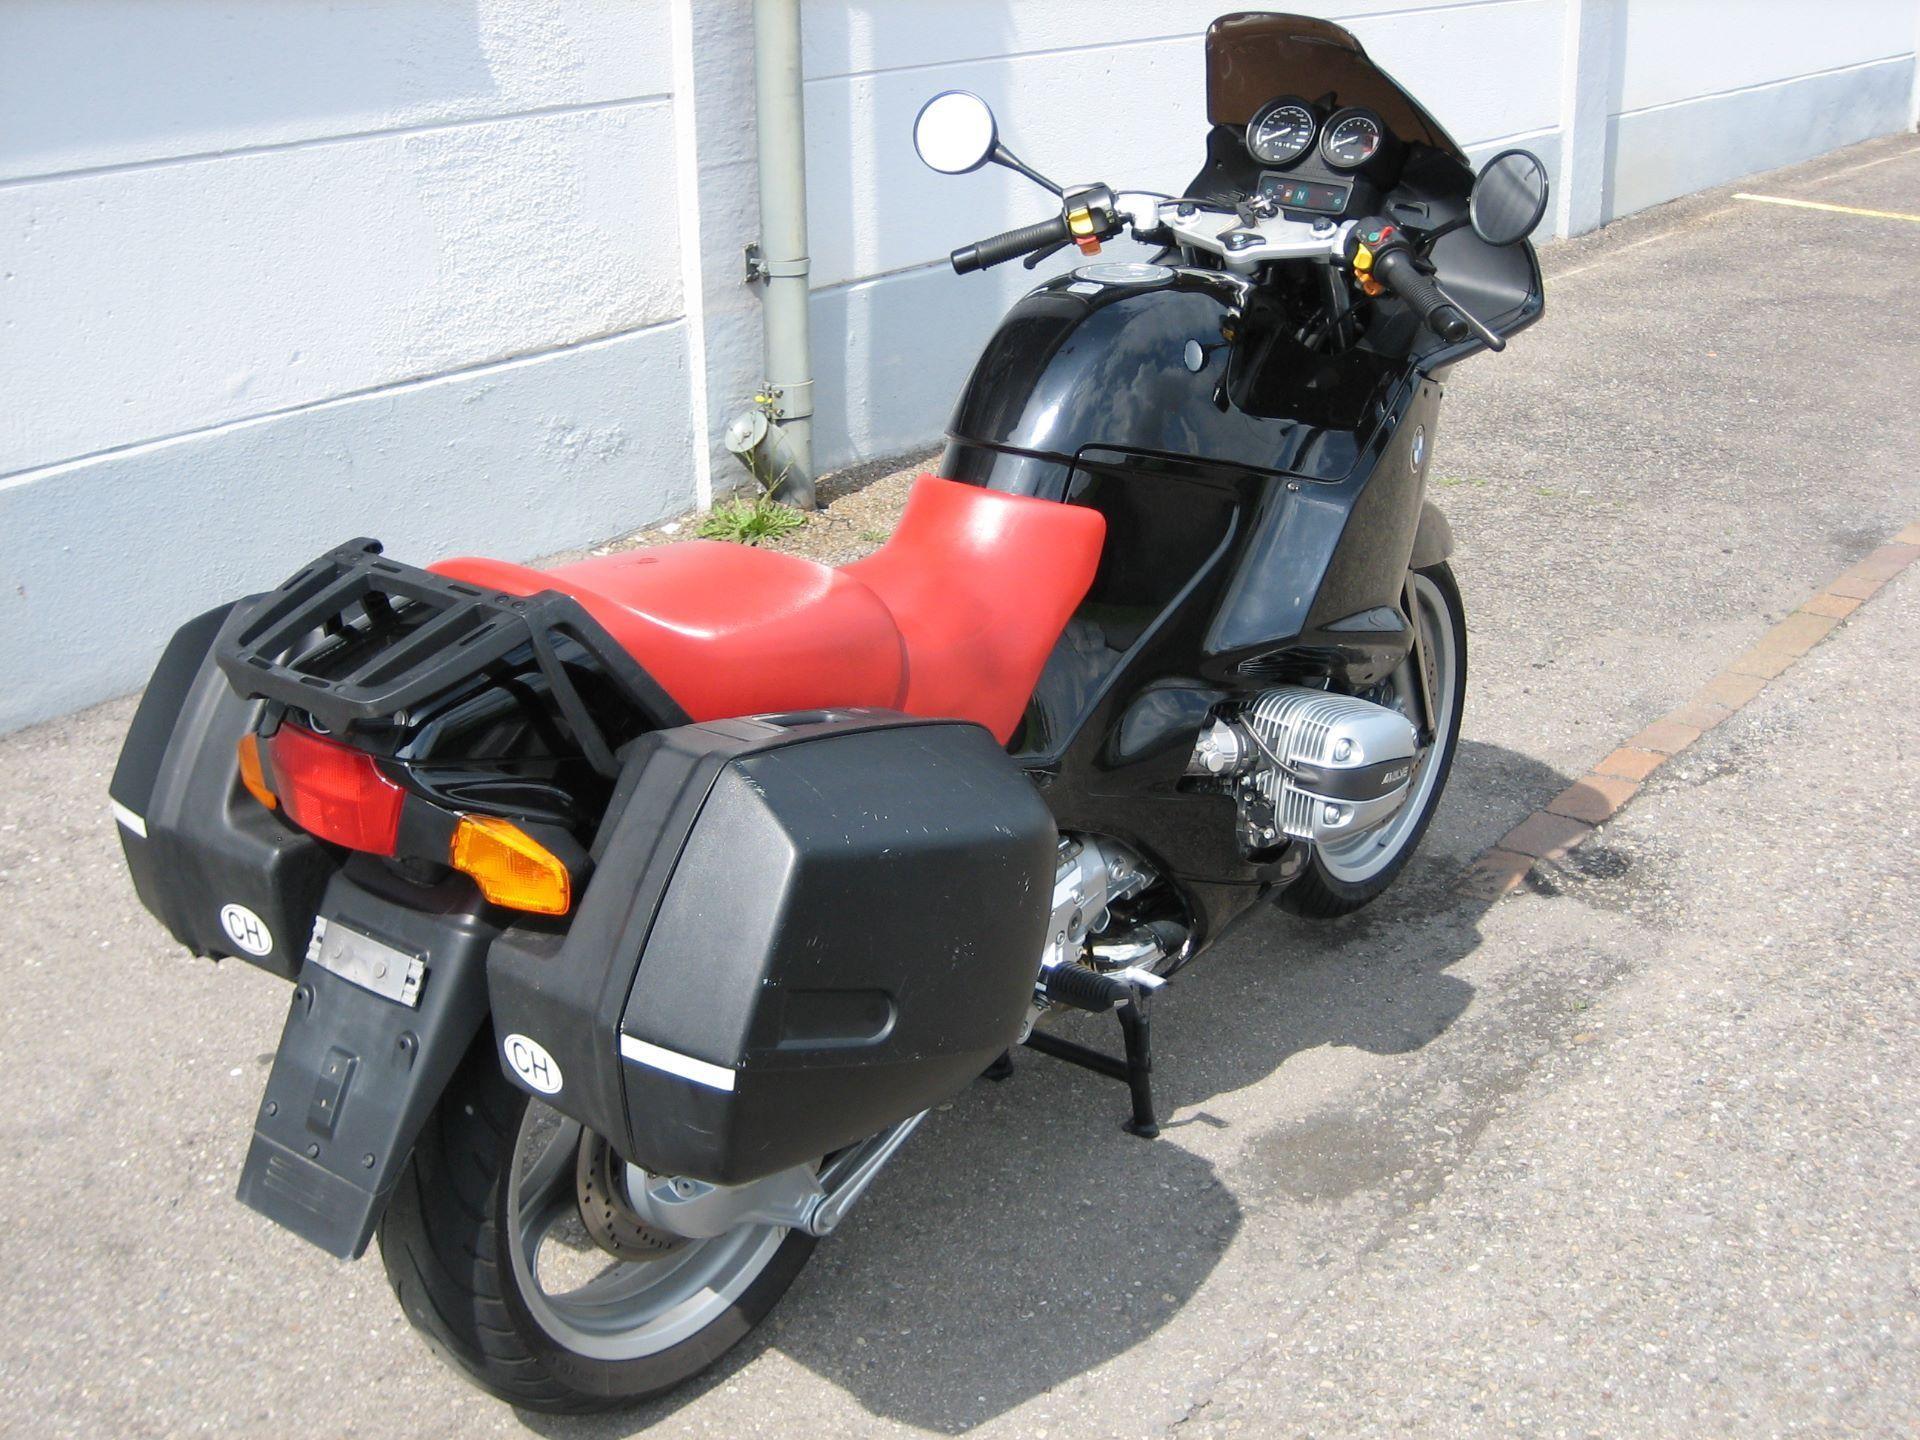 moto exportation acheter bmw r 1100 rs moto 91 ag h ri. Black Bedroom Furniture Sets. Home Design Ideas